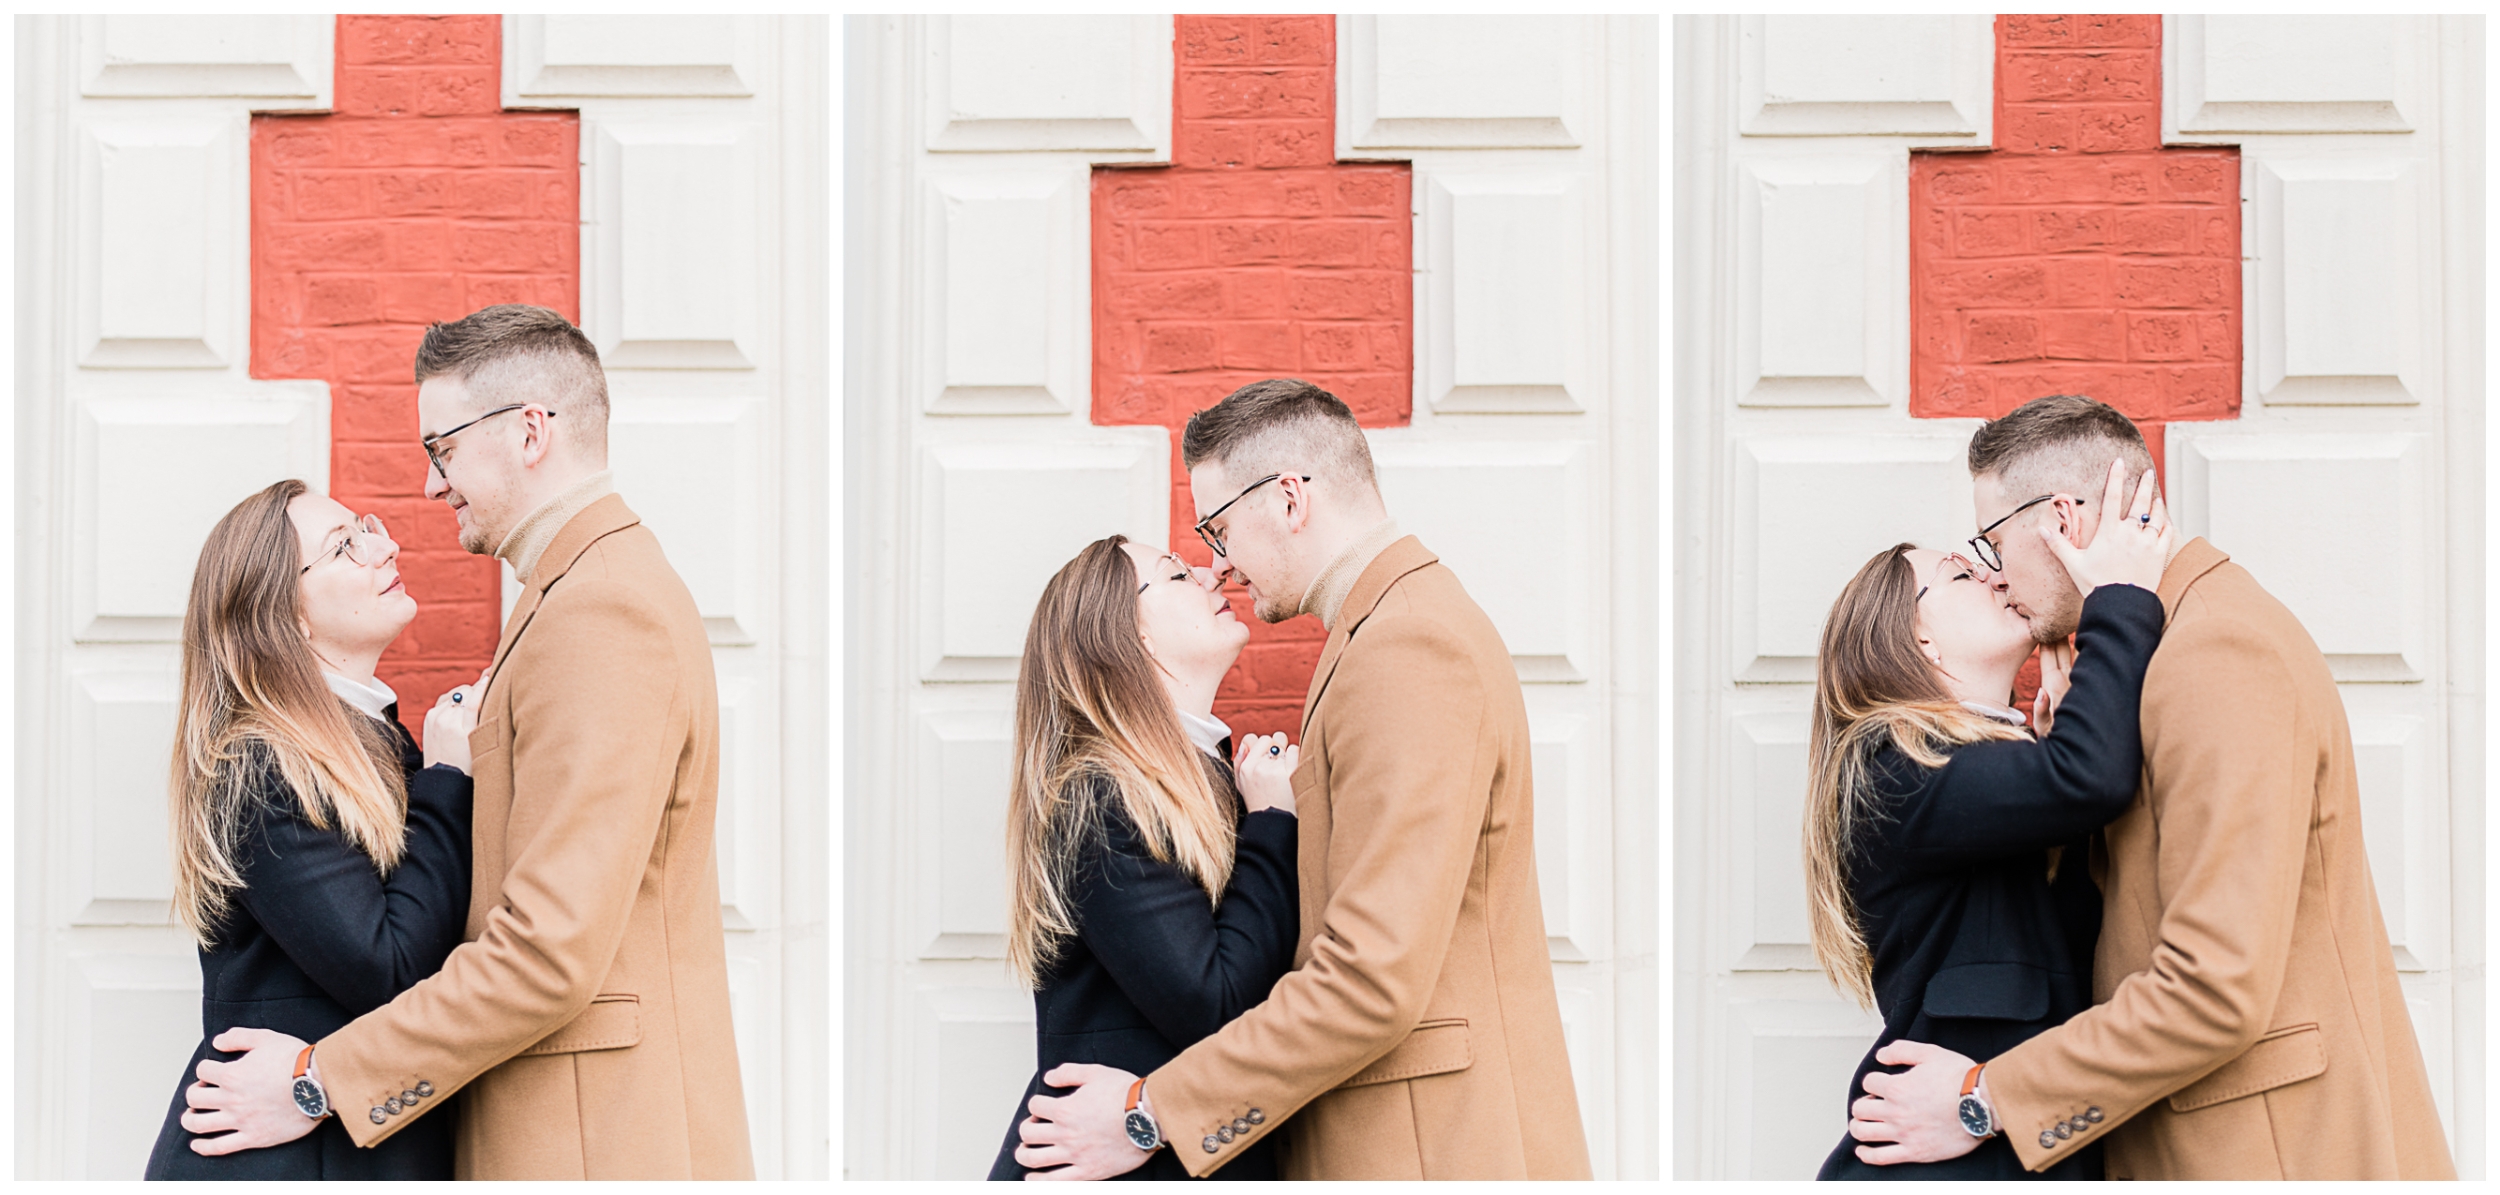 priscillapuzenat-photographe-couple-mariage-lille-tourcoing-nord-nordpasdecalais-france